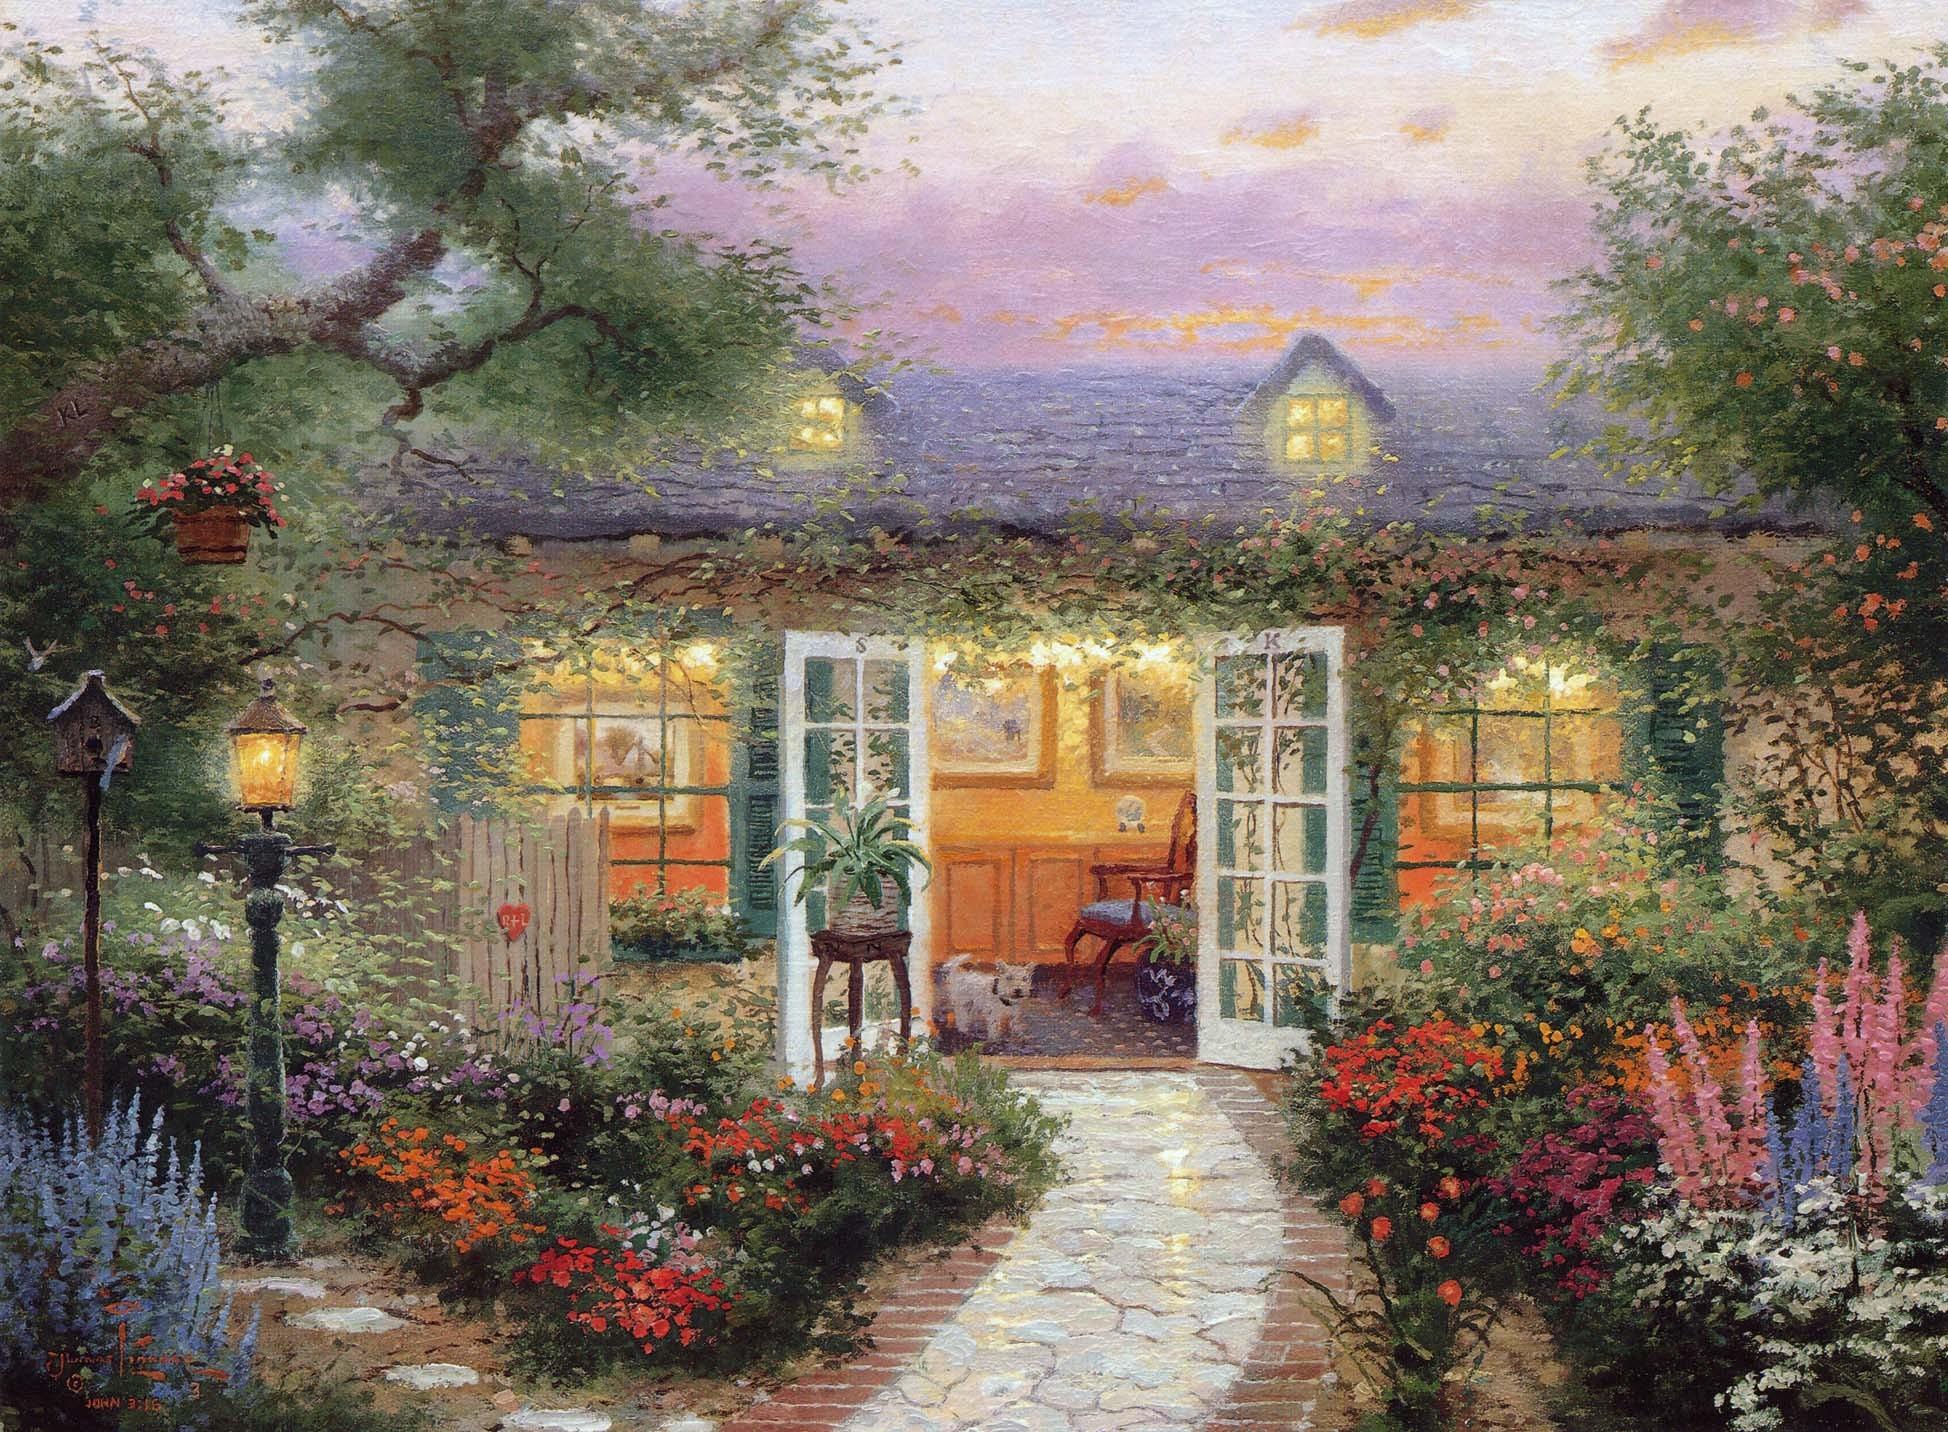 summer cottage wallpaper - photo #10